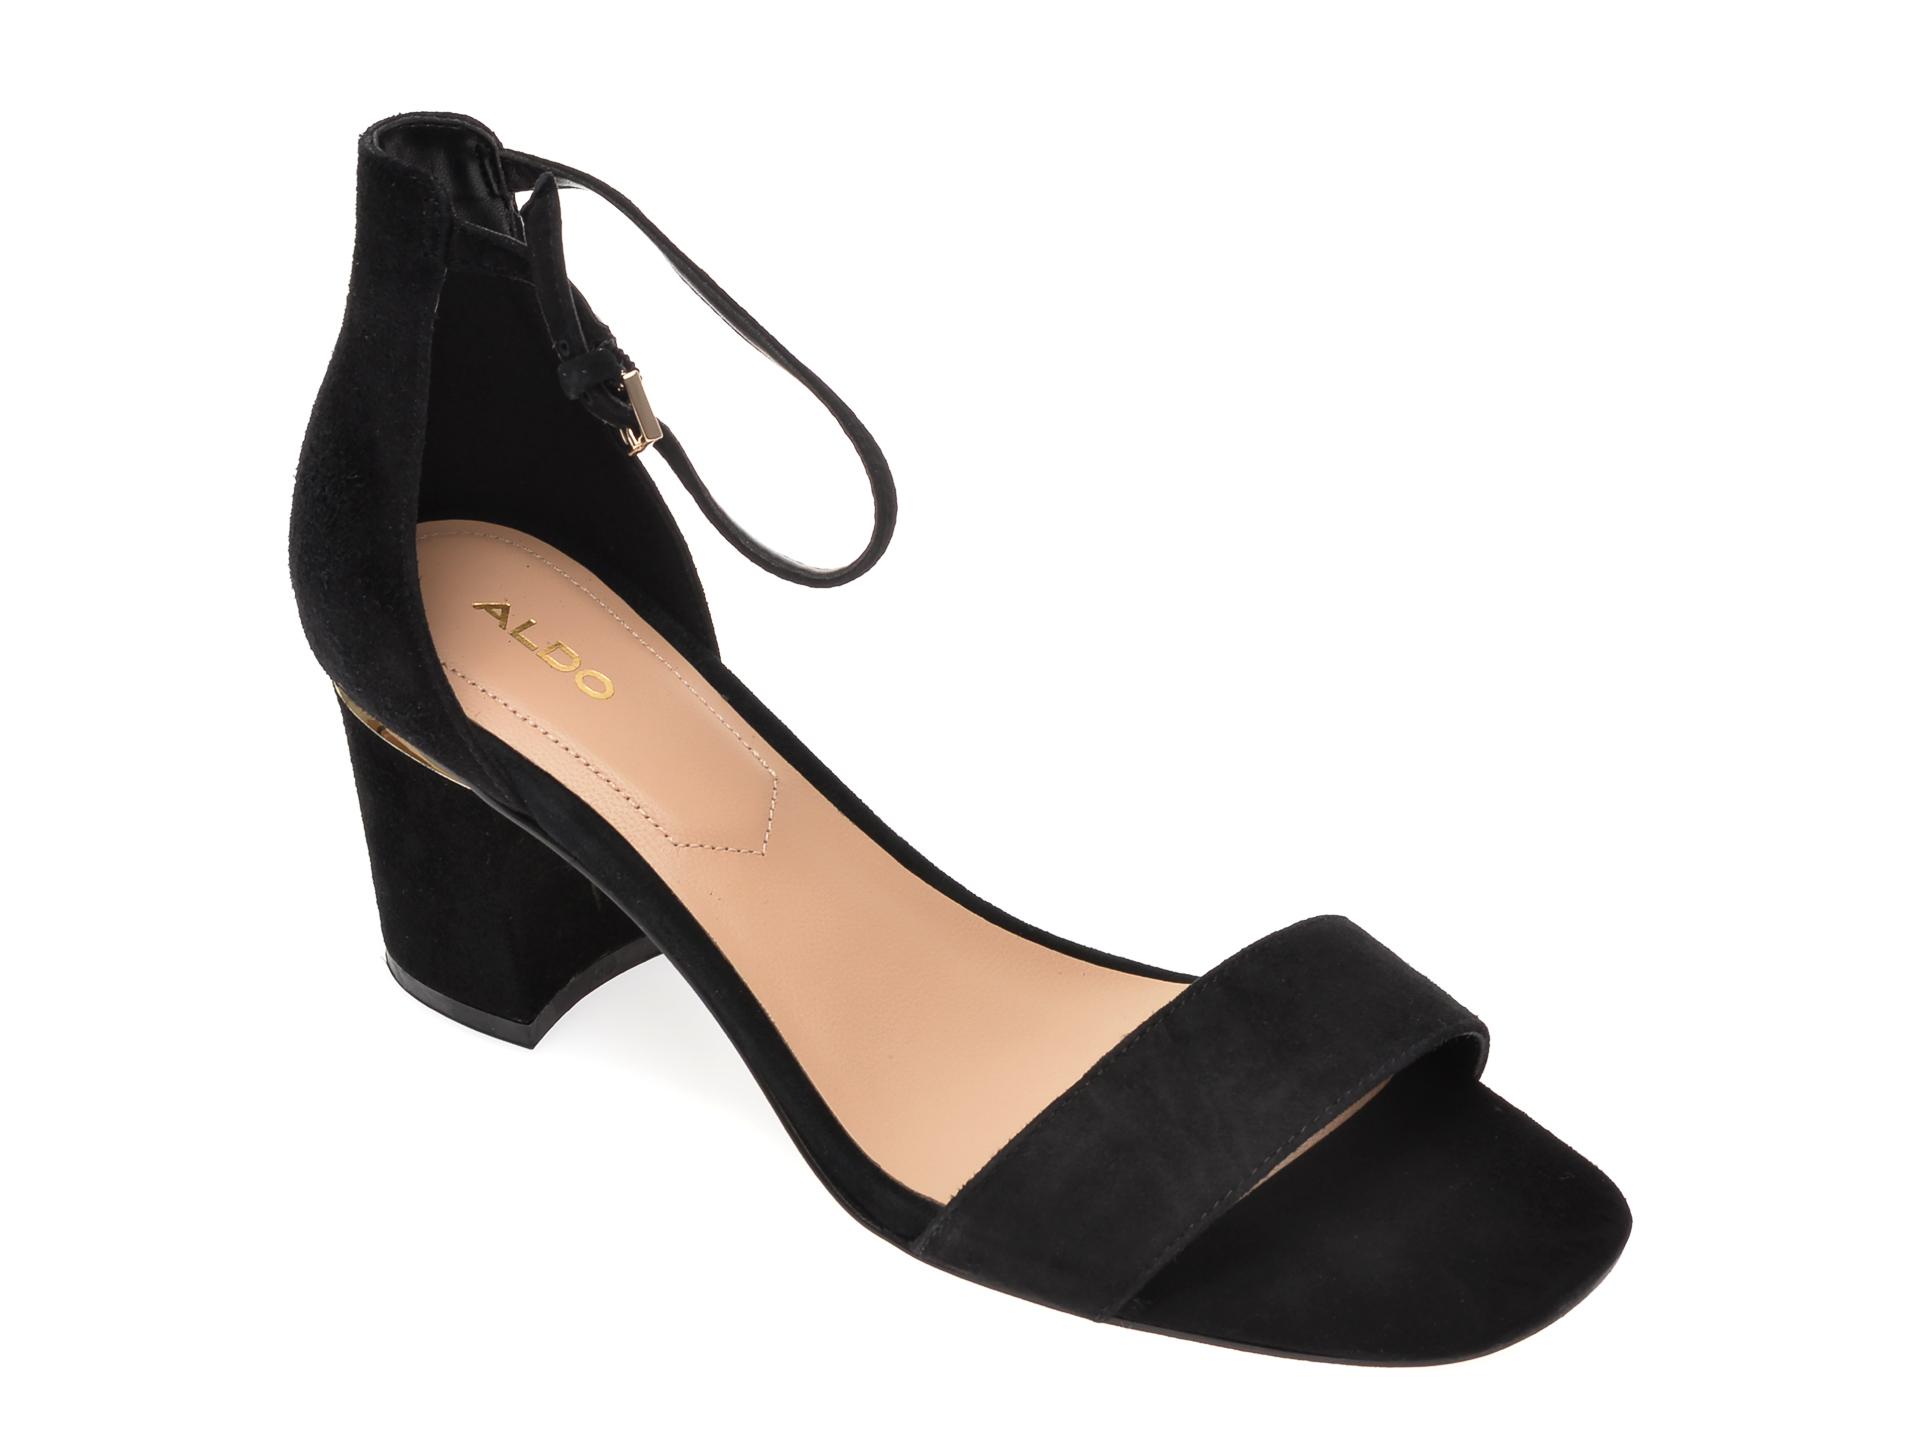 Sandale ALDO negre, Valentina001, din piele intoarsa imagine otter.ro 2021